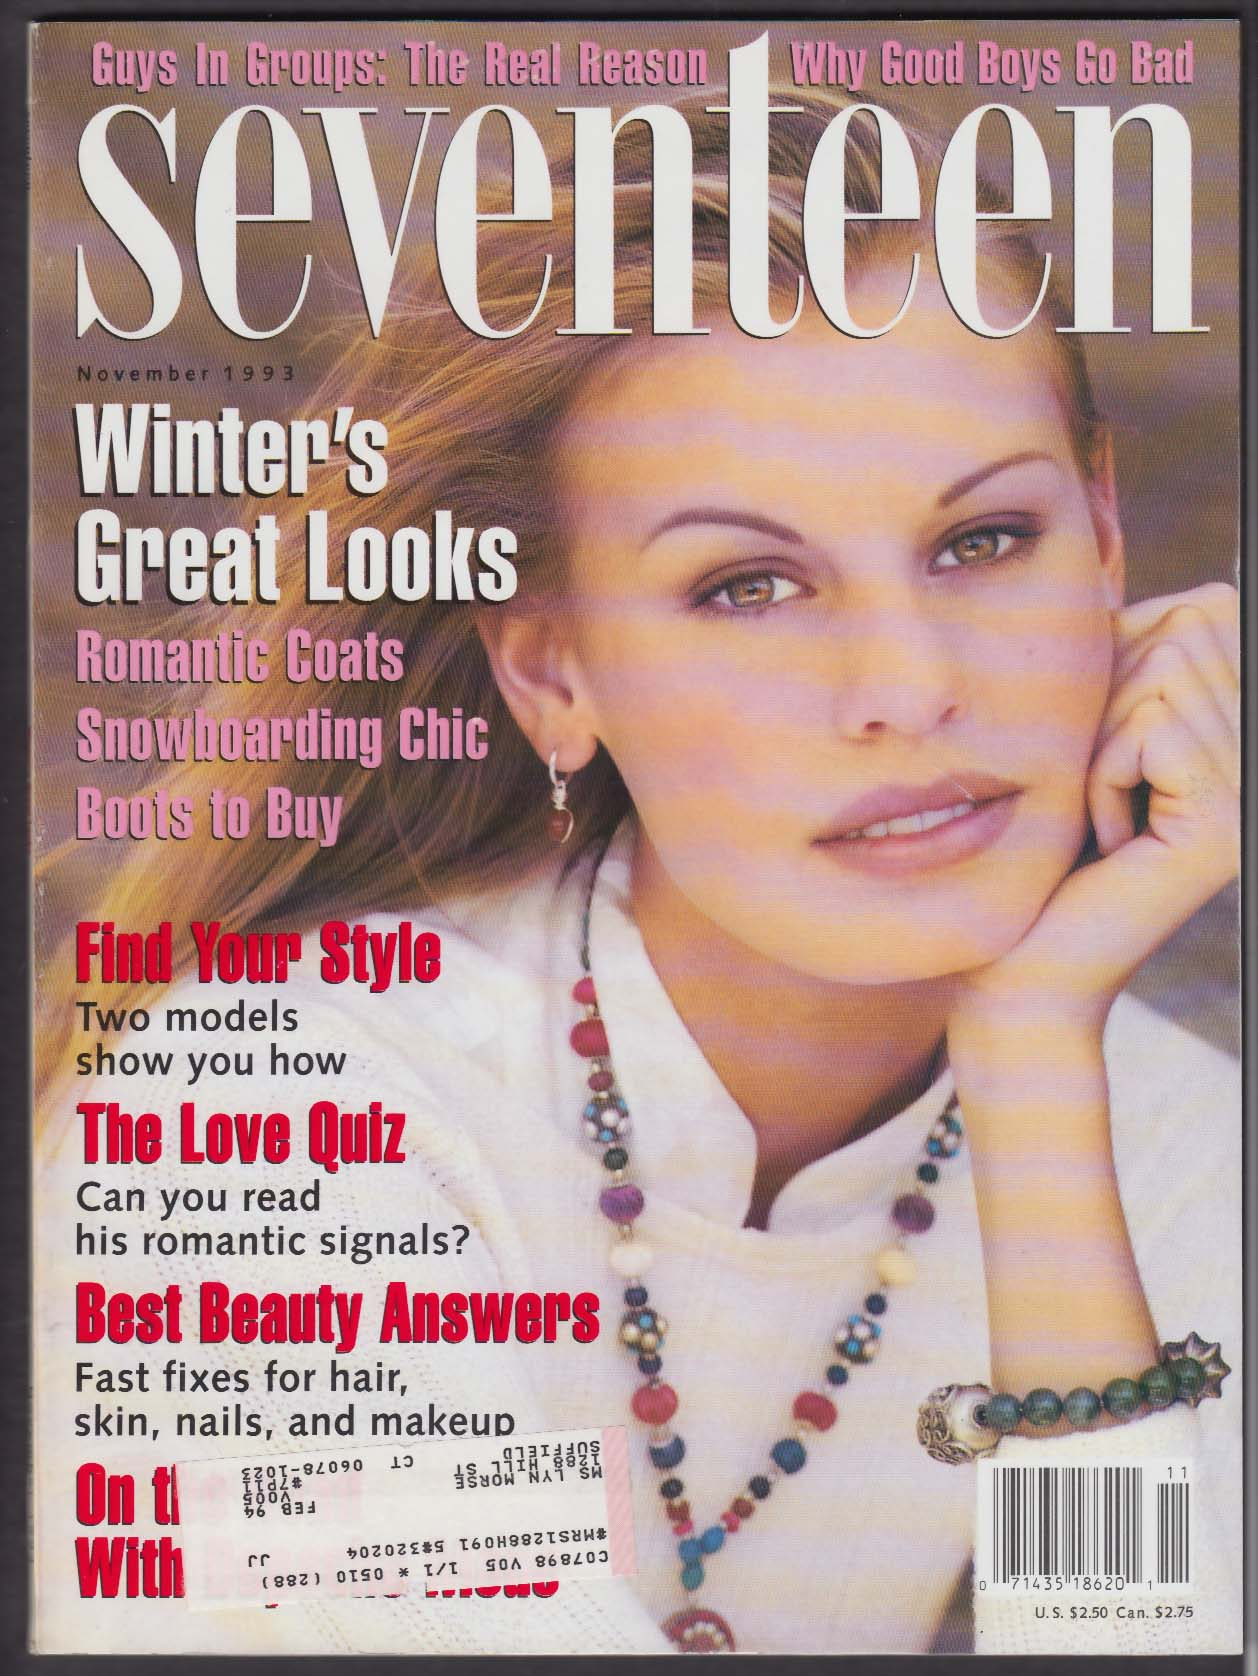 SEVENTEEN Depeche Mode Lillo Brancato Tabitha Soren 11 1993